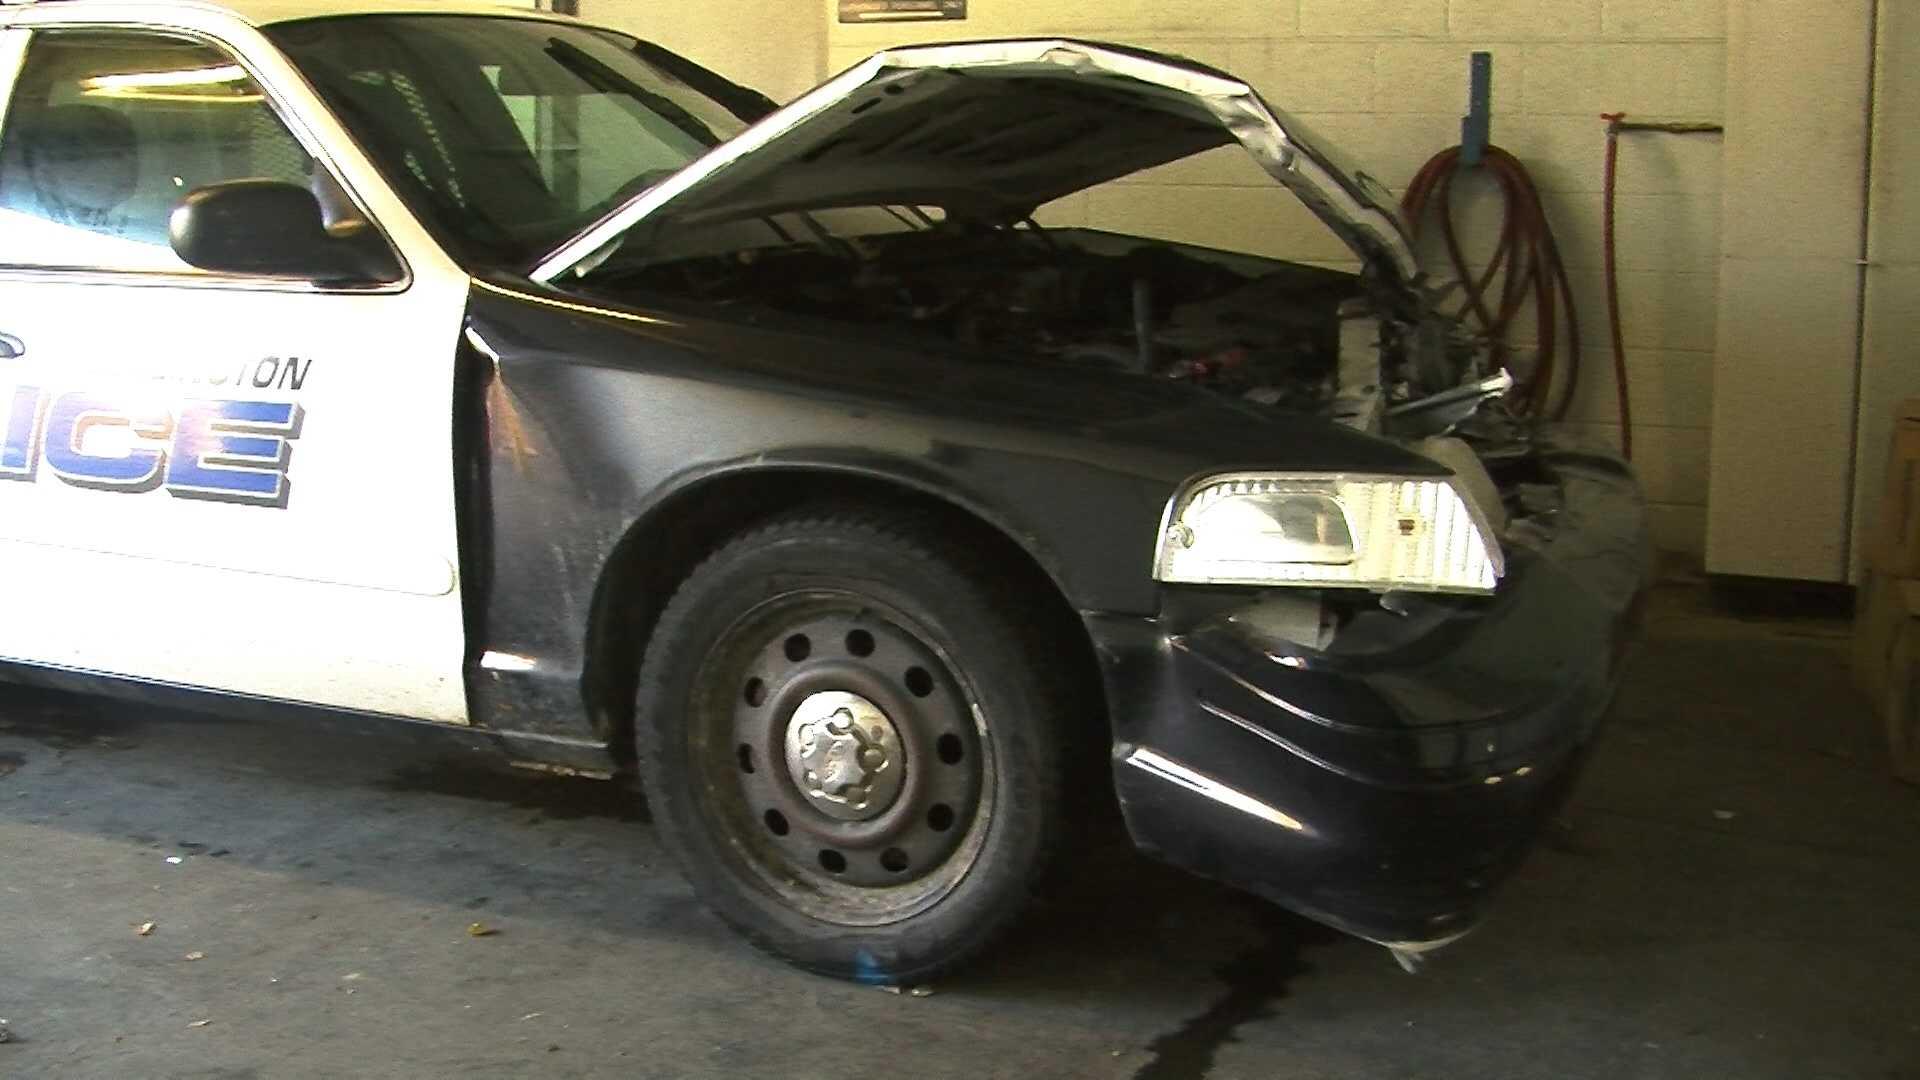 102012 Burlington police cruiser involved in crash - img